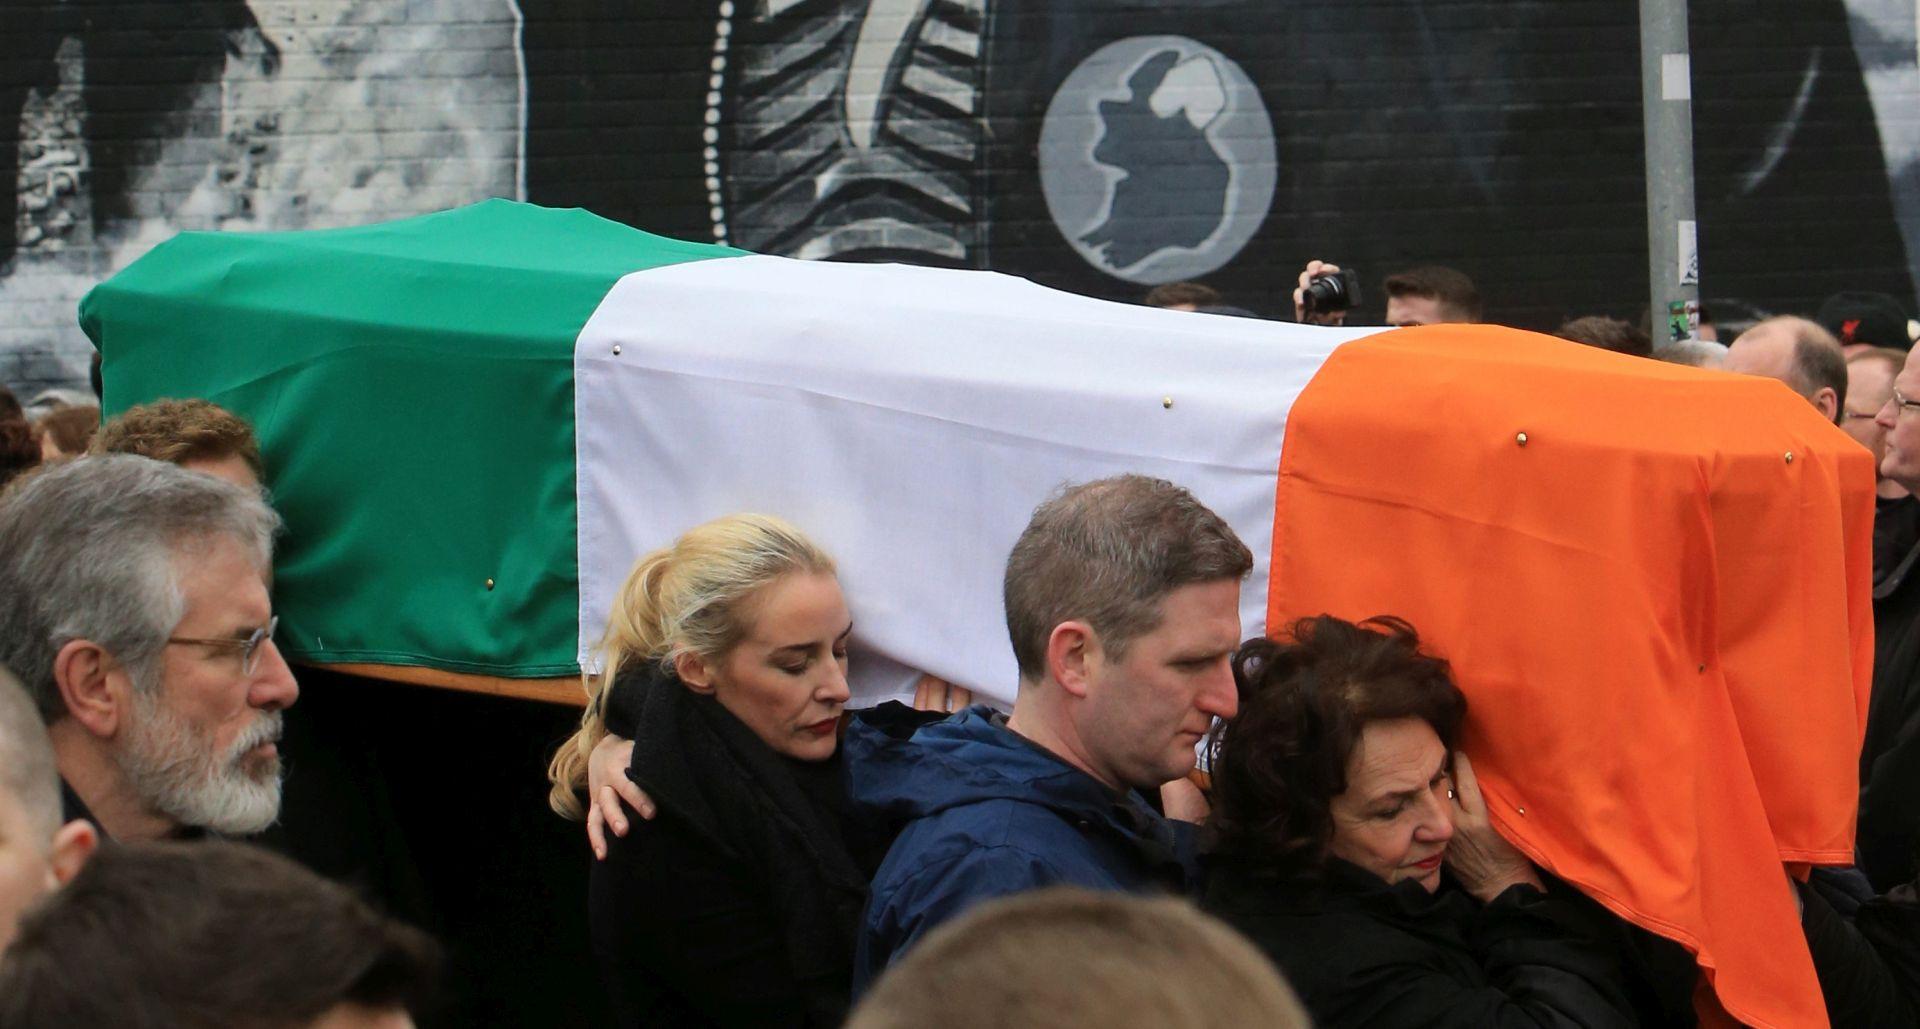 Tisuće ljudi na sprovodu Martina McGuinnessa u Derryju